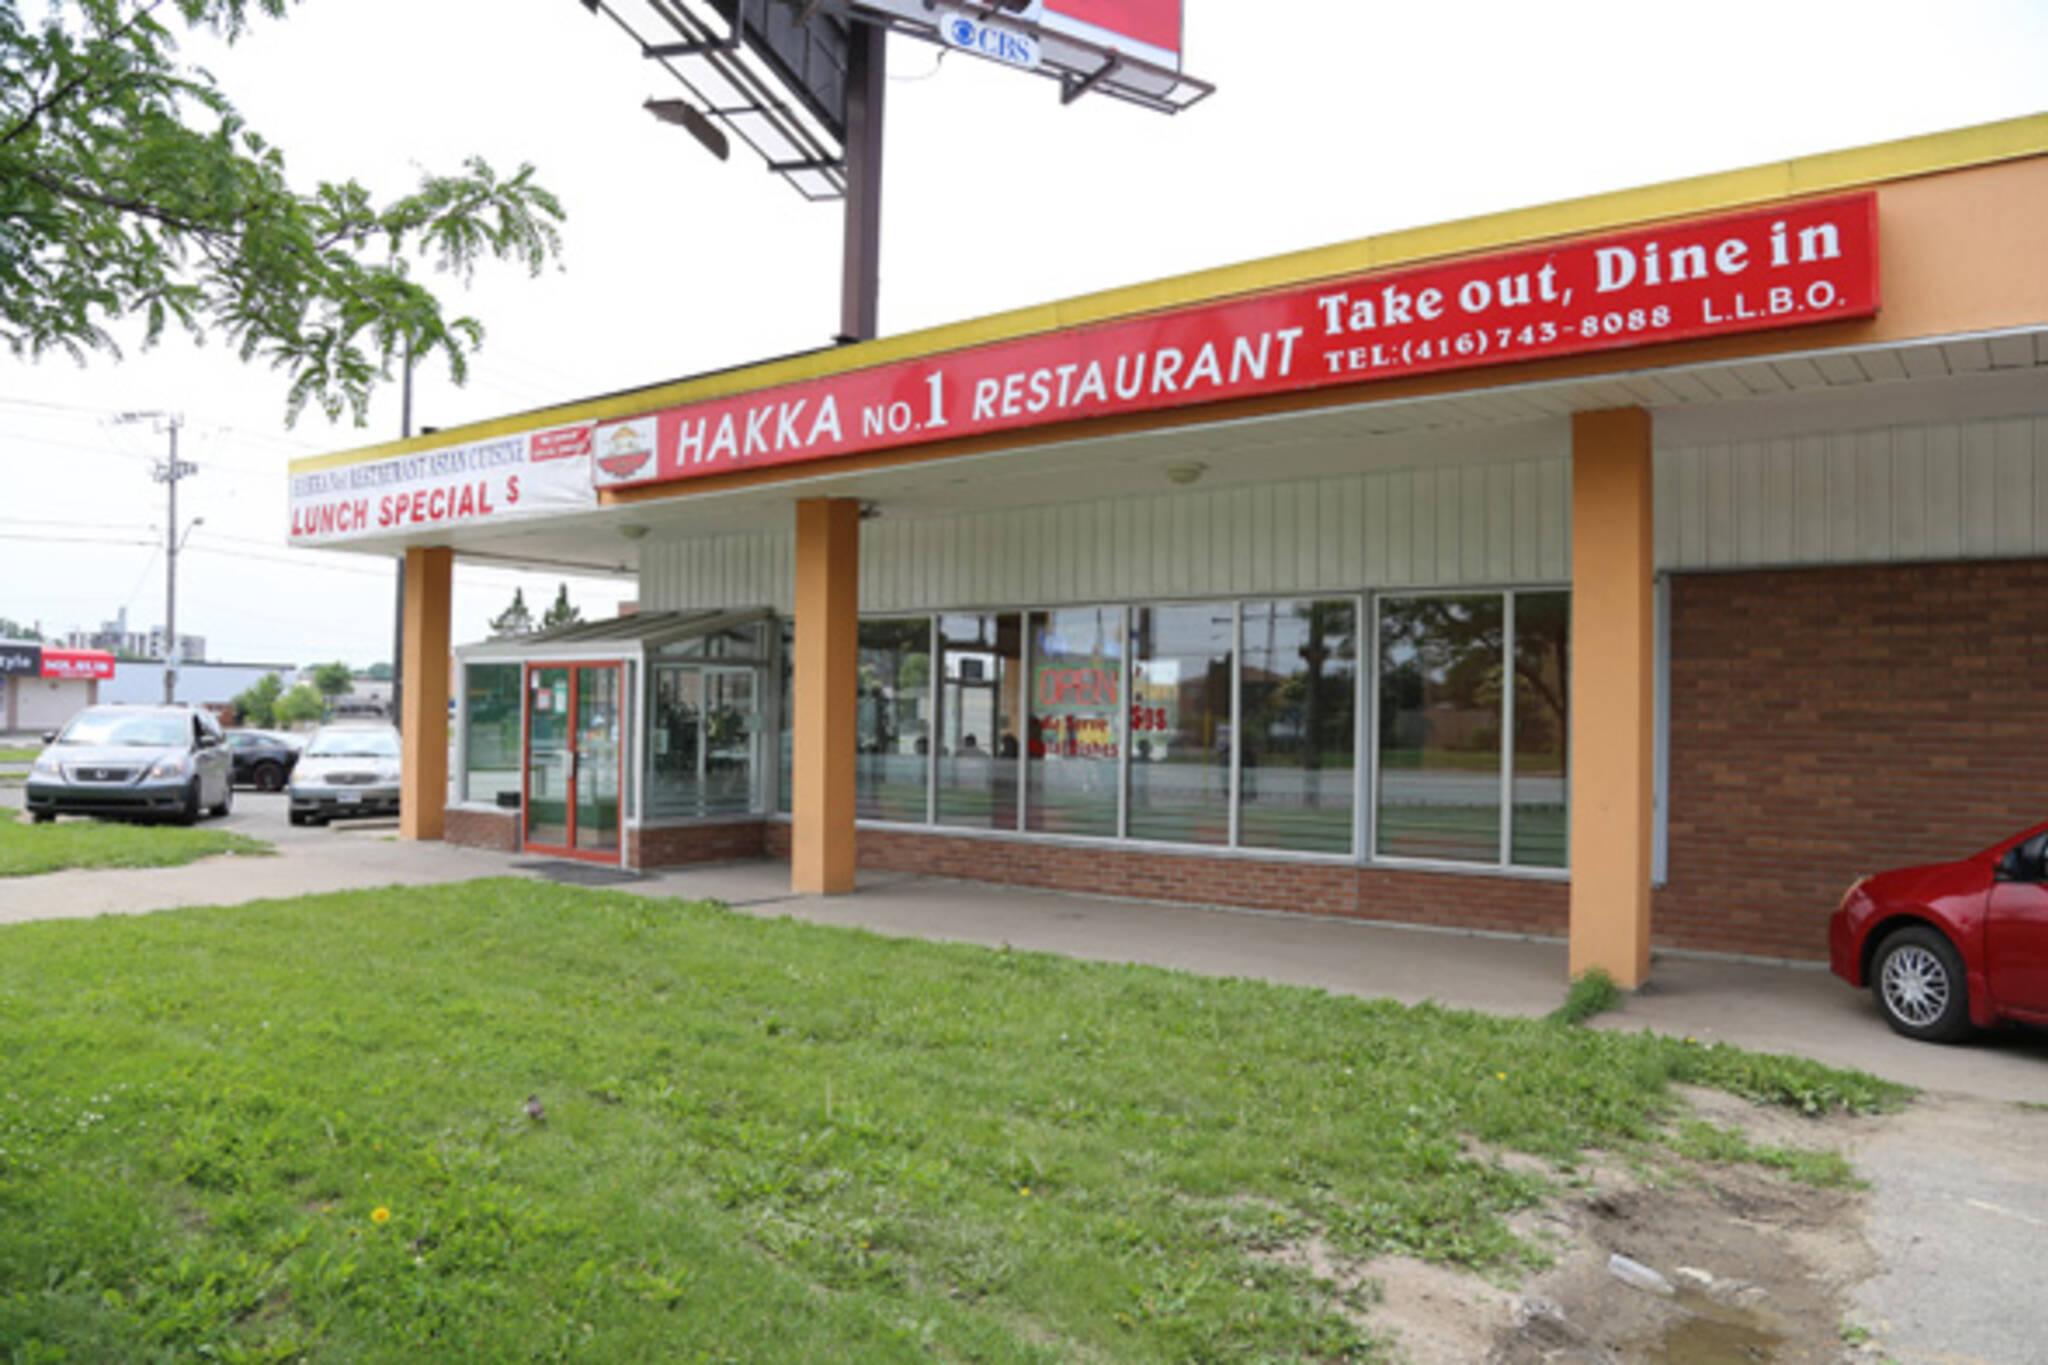 201379-hakka-no-1-restaurant.jpg